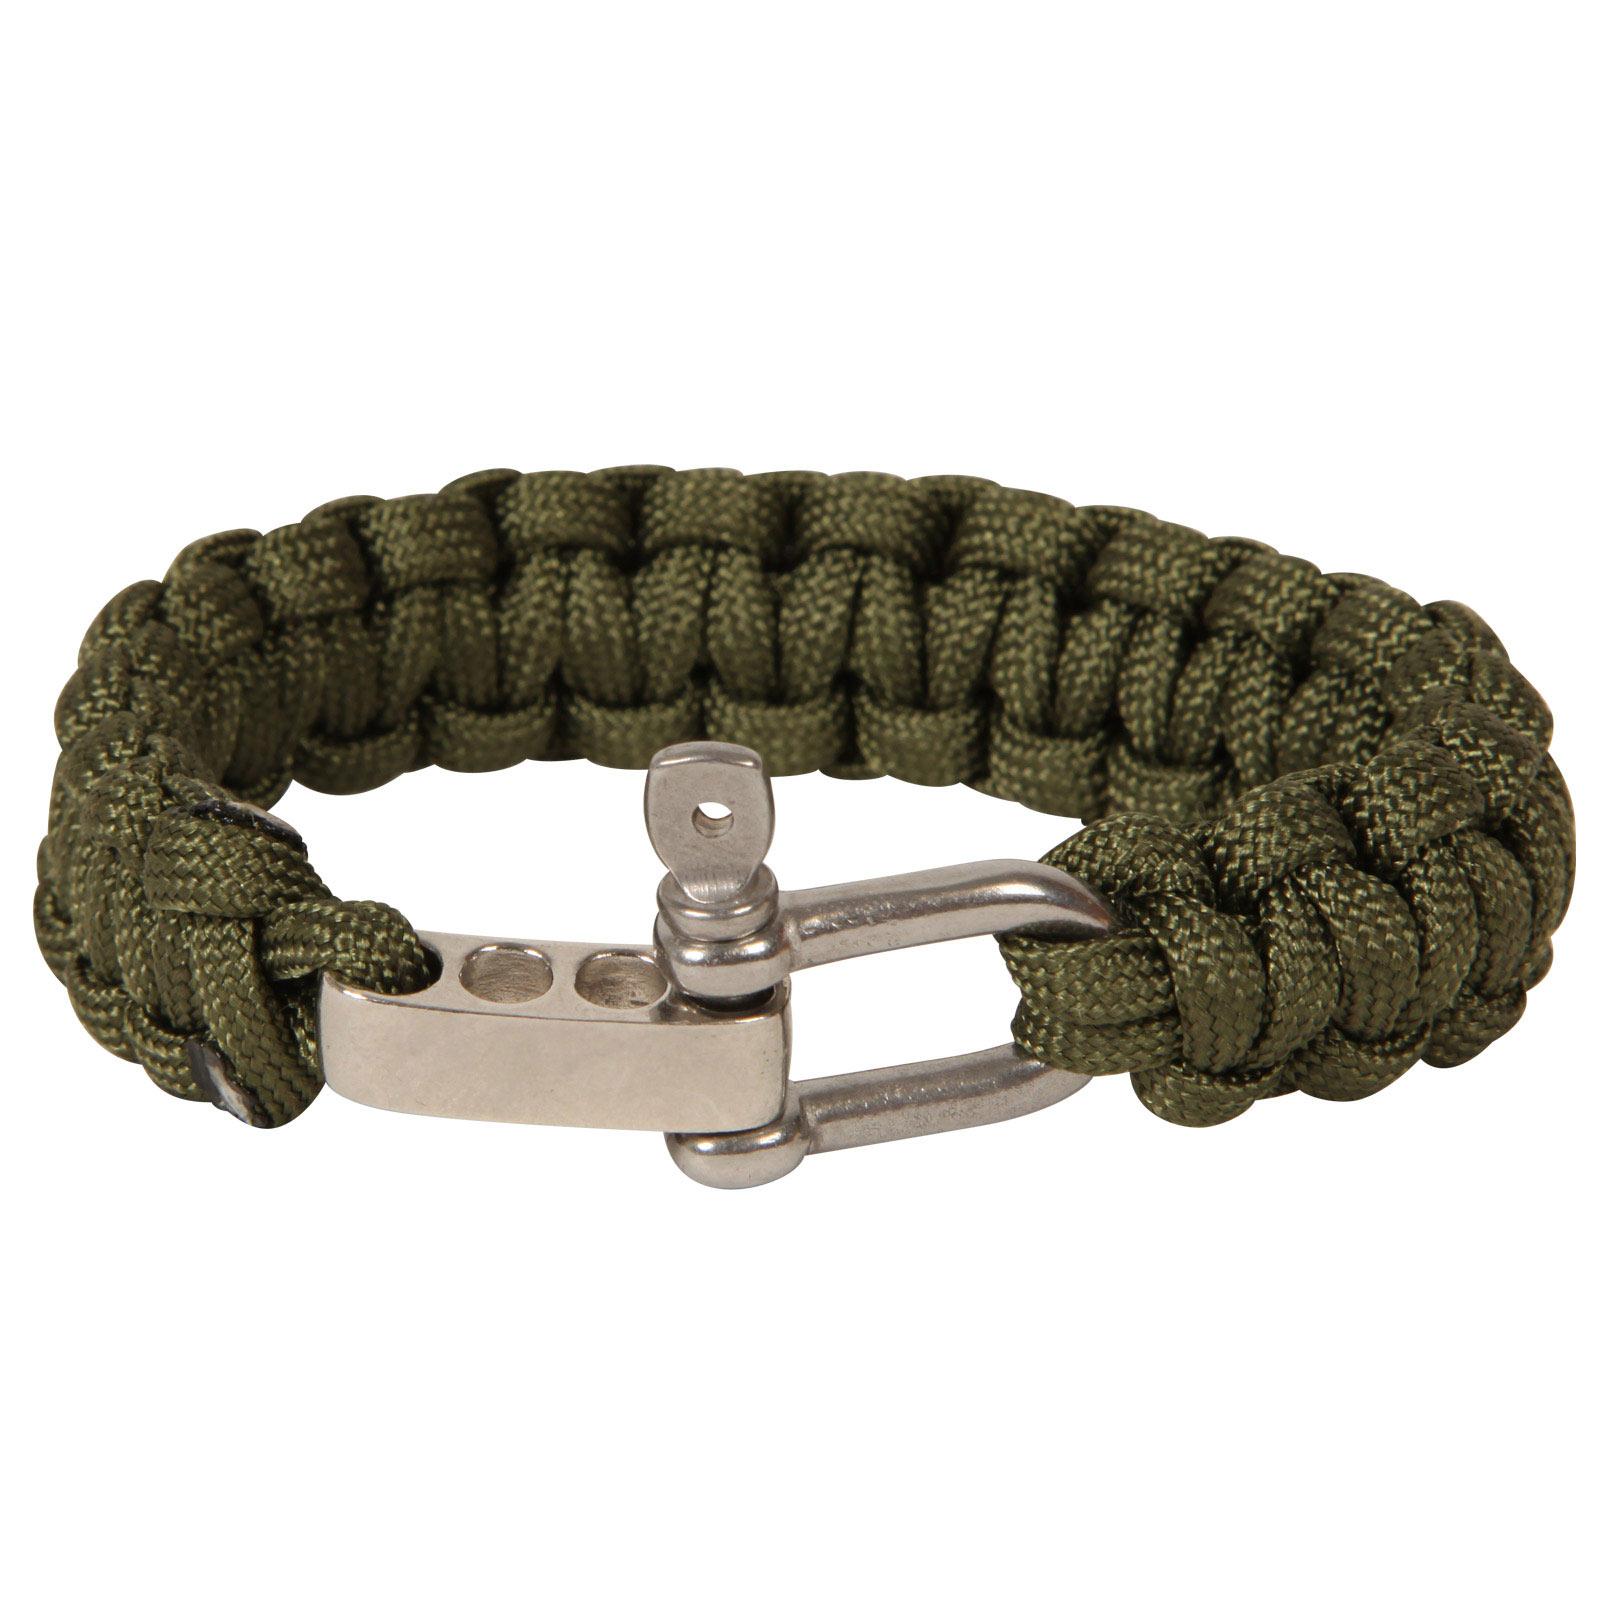 De Survie Survie Kaki De Bracelet Bracelet VSjzGqUMpL